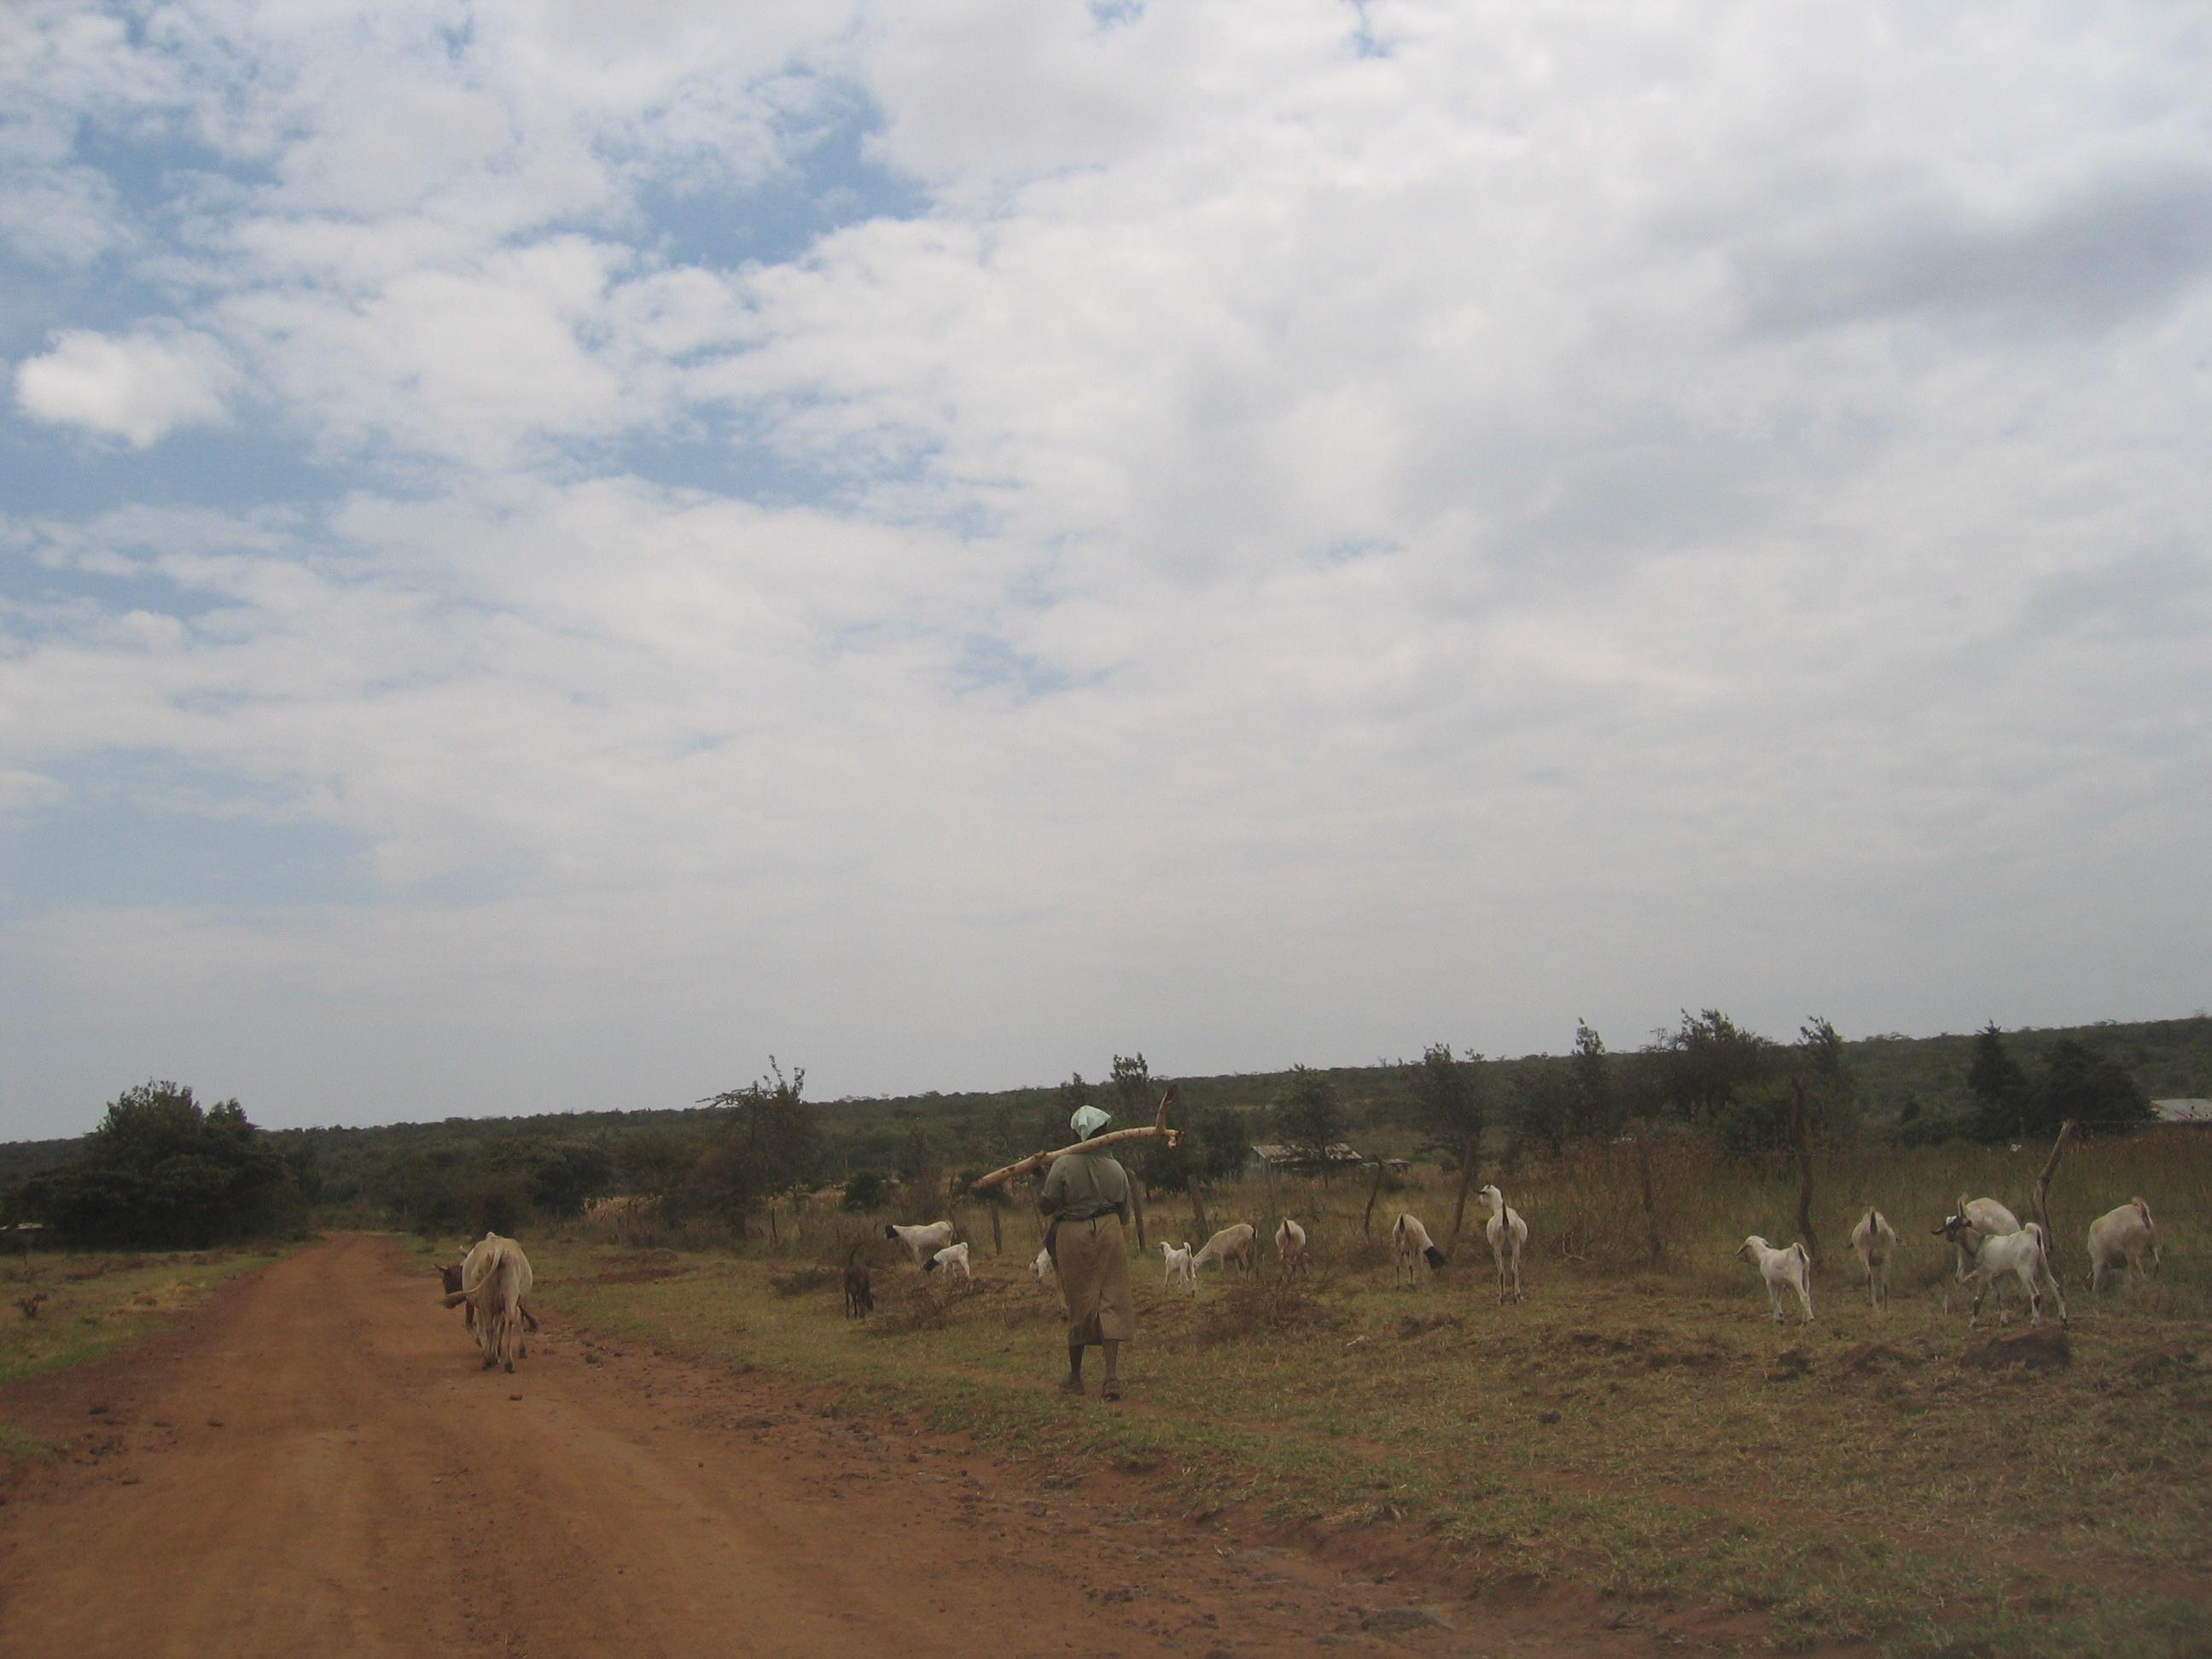 kenya_riftvalley_landscape_08